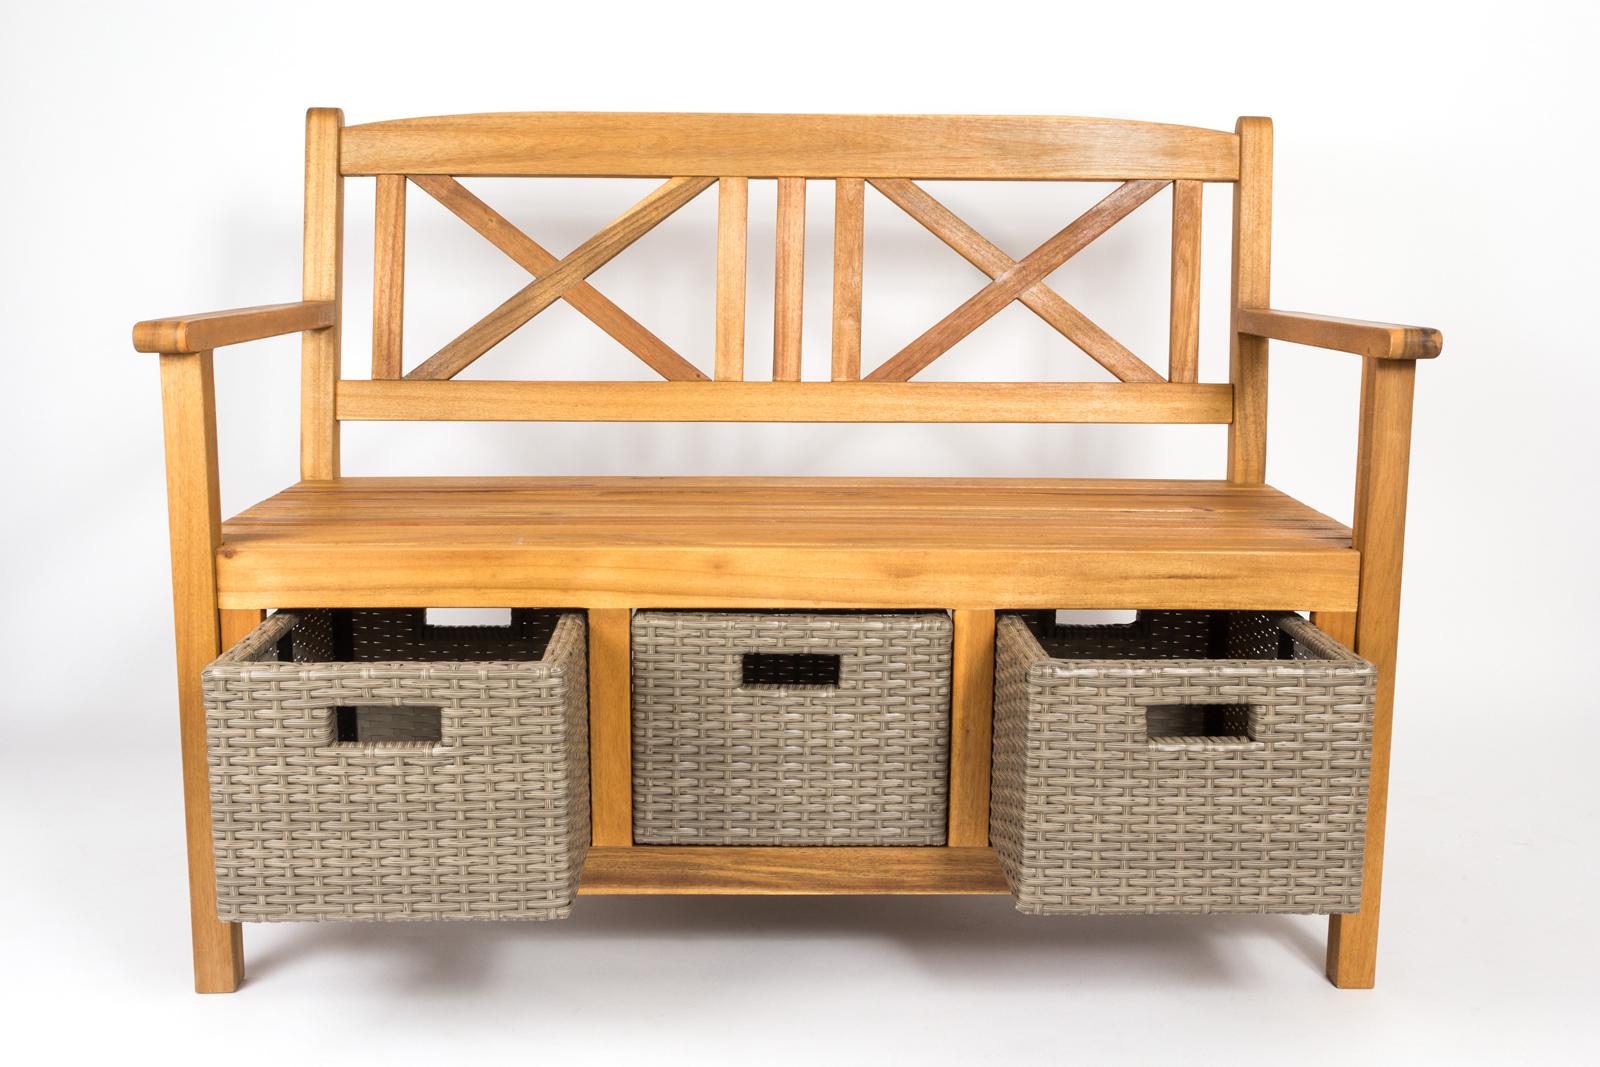 sam g nstige akazie gartenbank fsc 2 sitzer 120 cm elliott. Black Bedroom Furniture Sets. Home Design Ideas